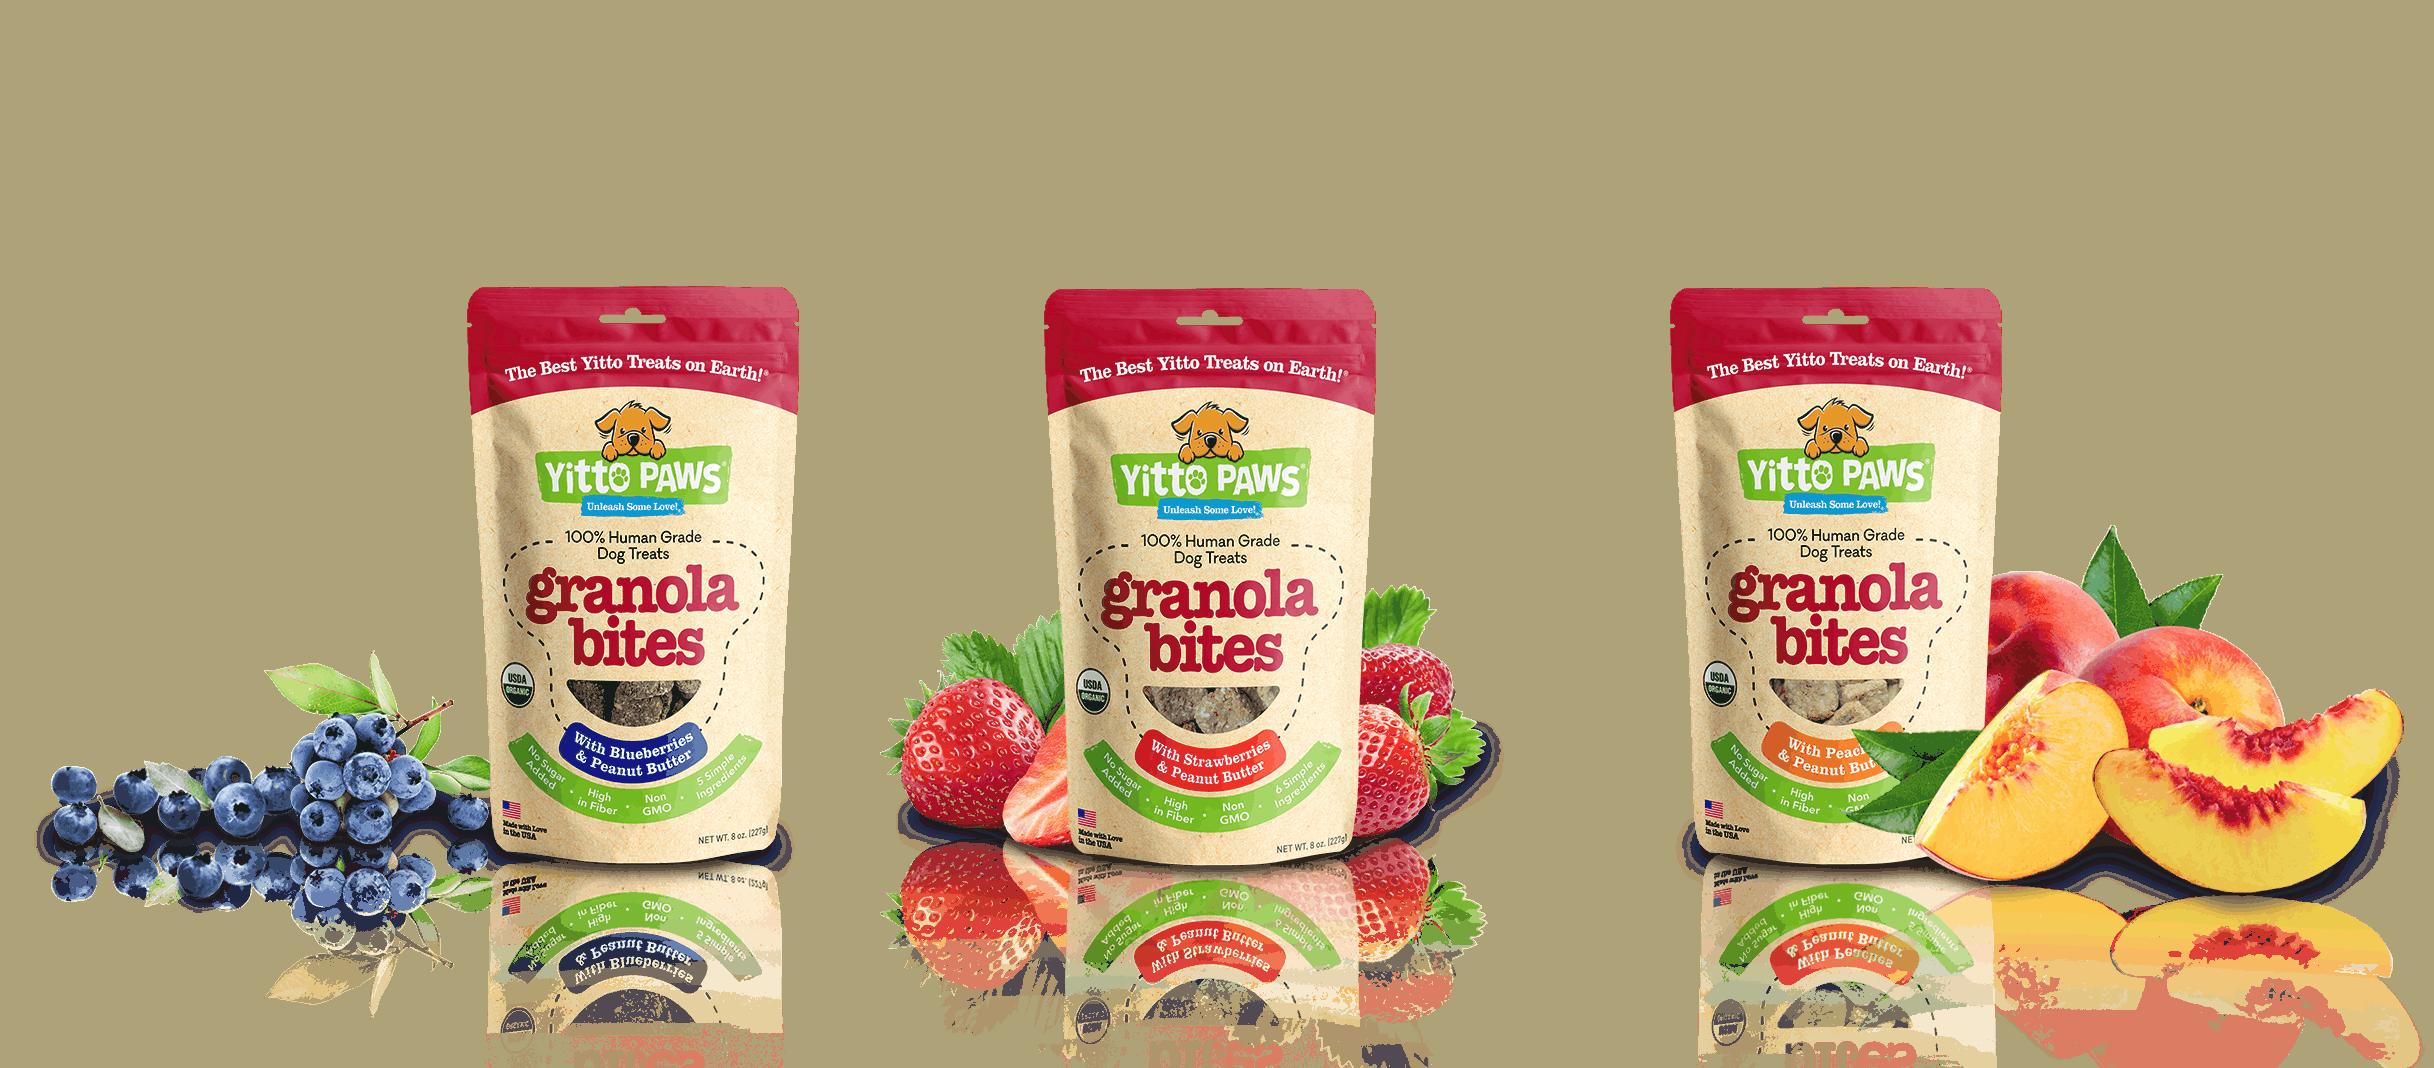 Yitto Paws Granola Bites come in three delicious 100% Organic flavors: Blueberry, Strawberry, and Peach